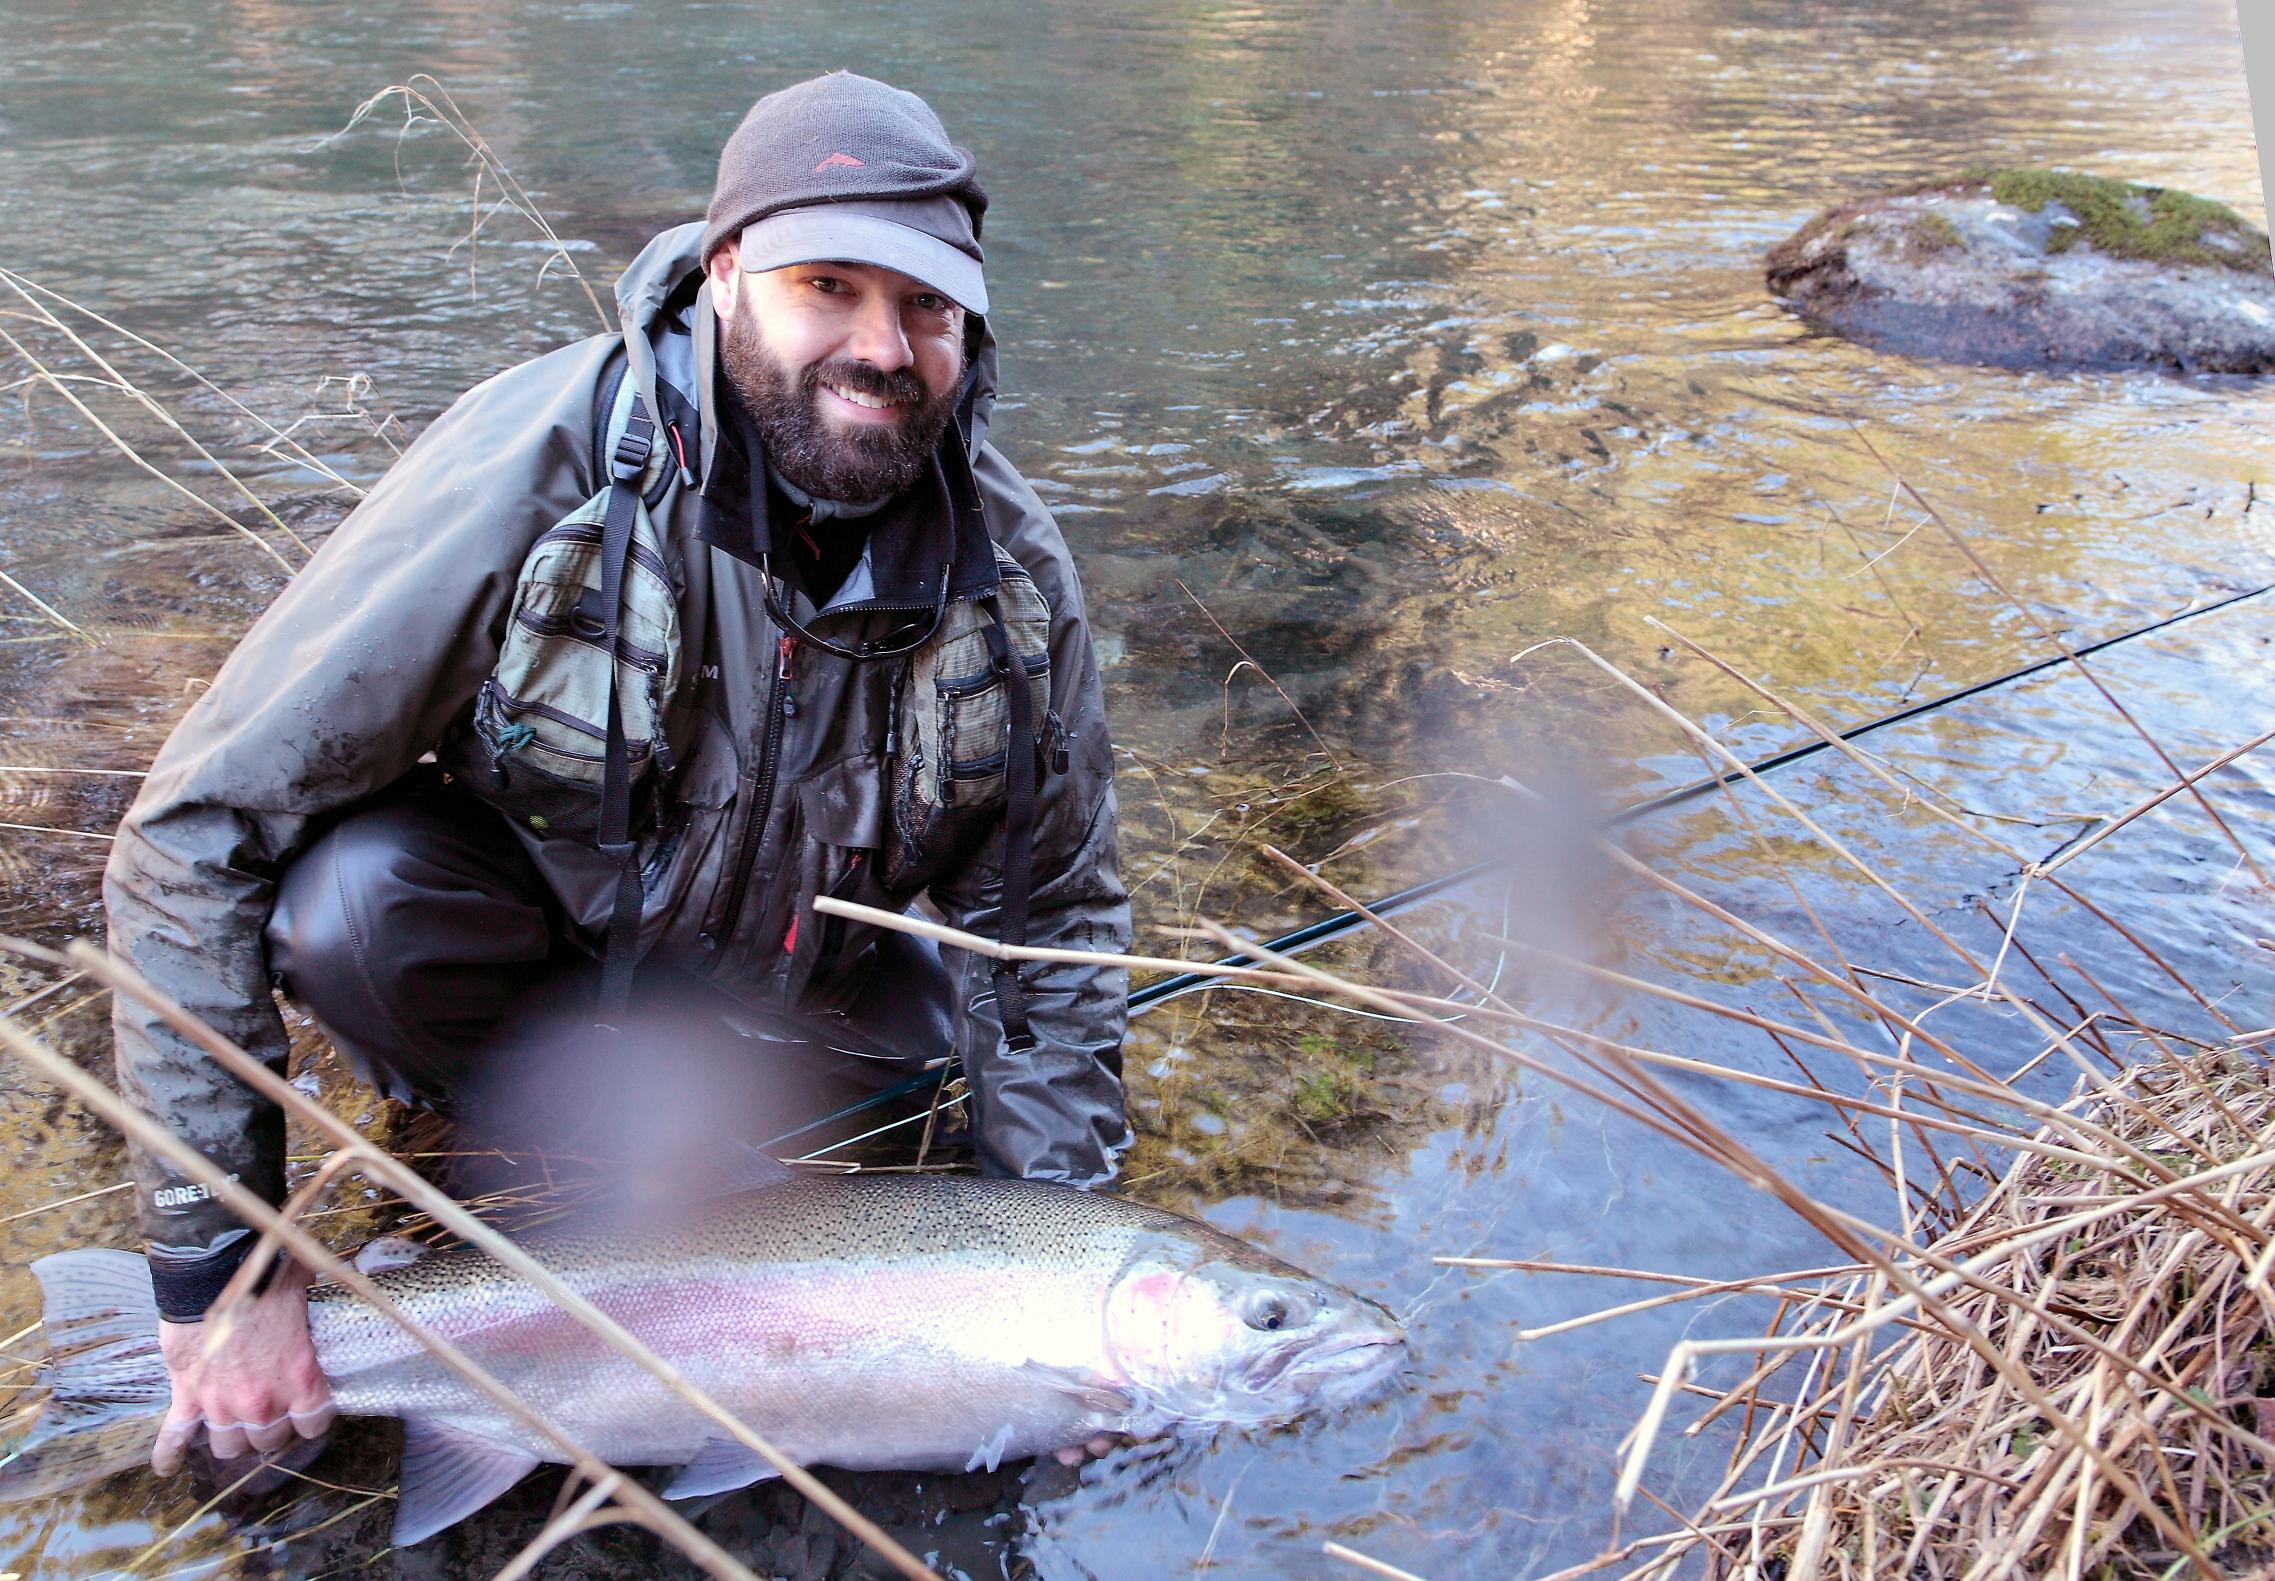 john with buck stlhd 4 sm.JPG